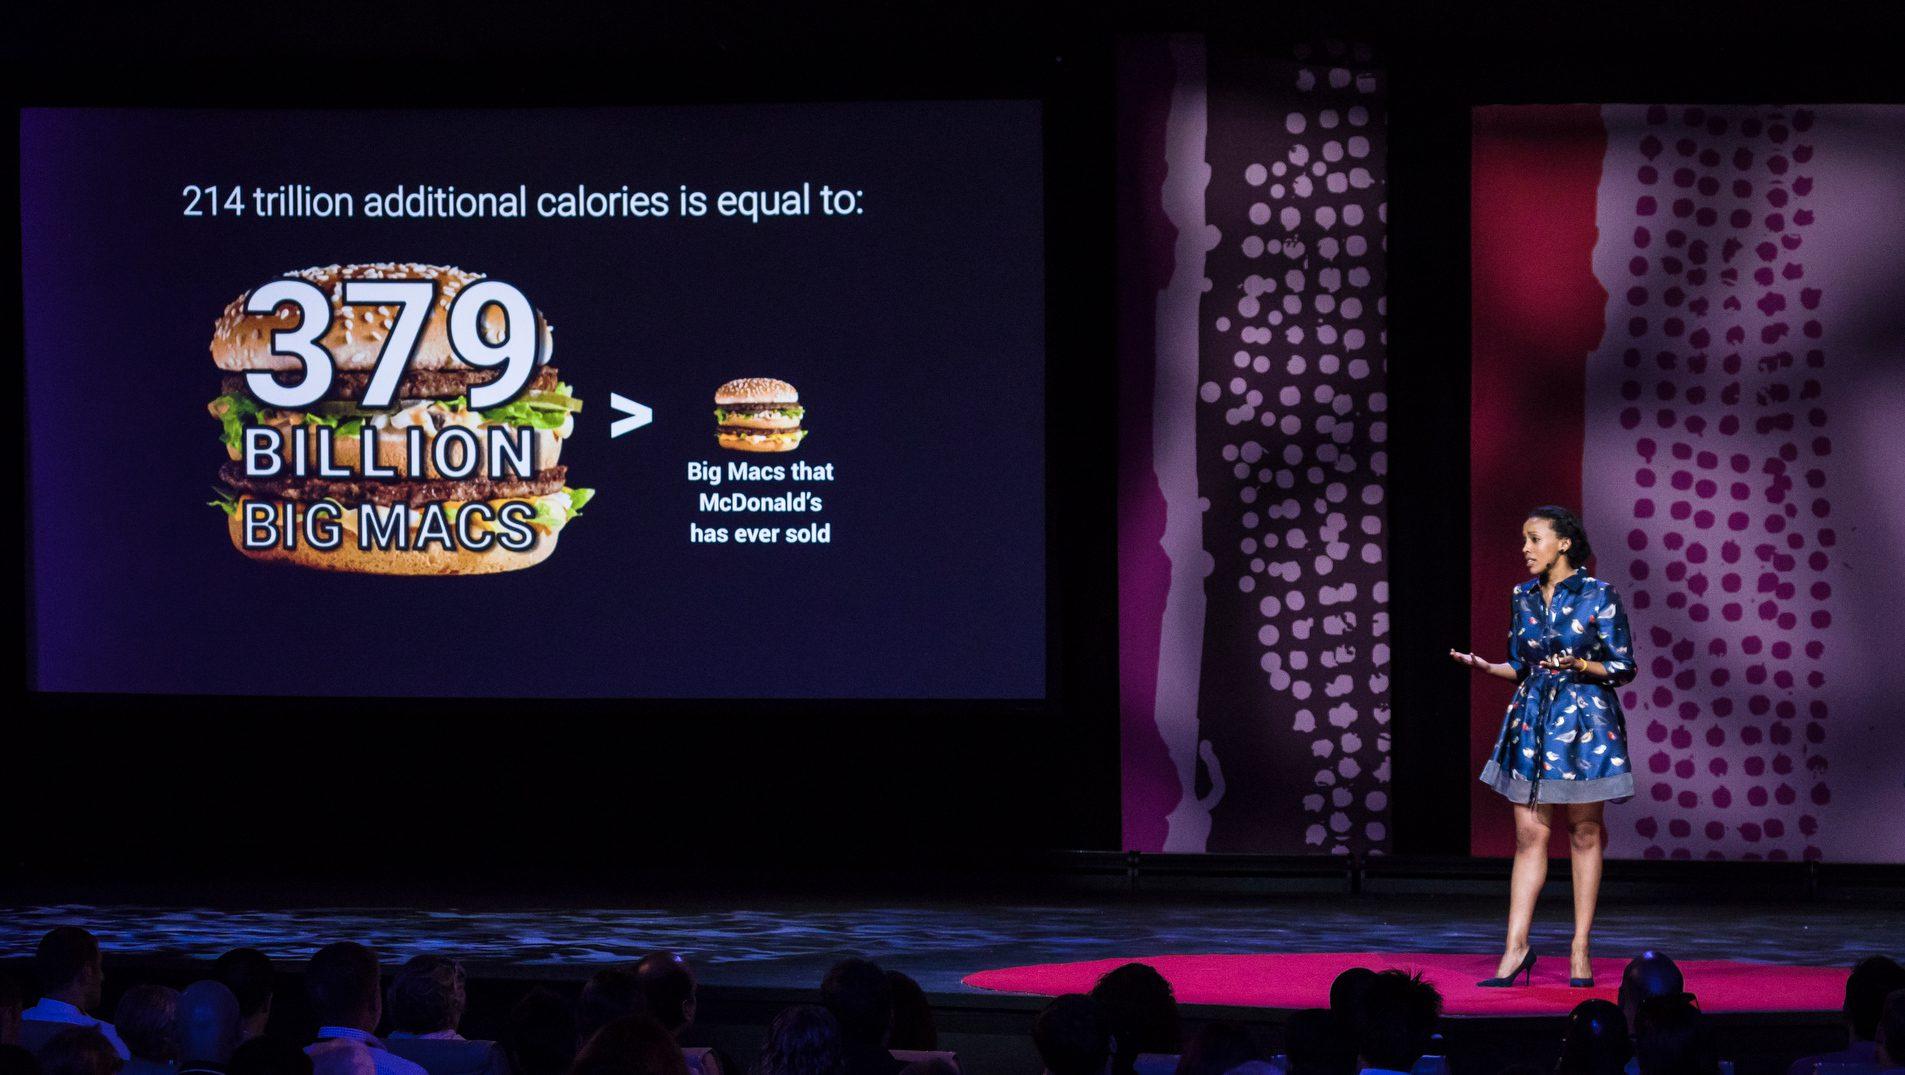 Sara Menker speaks at TEDGlobal 2017 - Builders, Truth Tellers, Catalysts - August 27-30, 2017, Arusha, Tanzania.